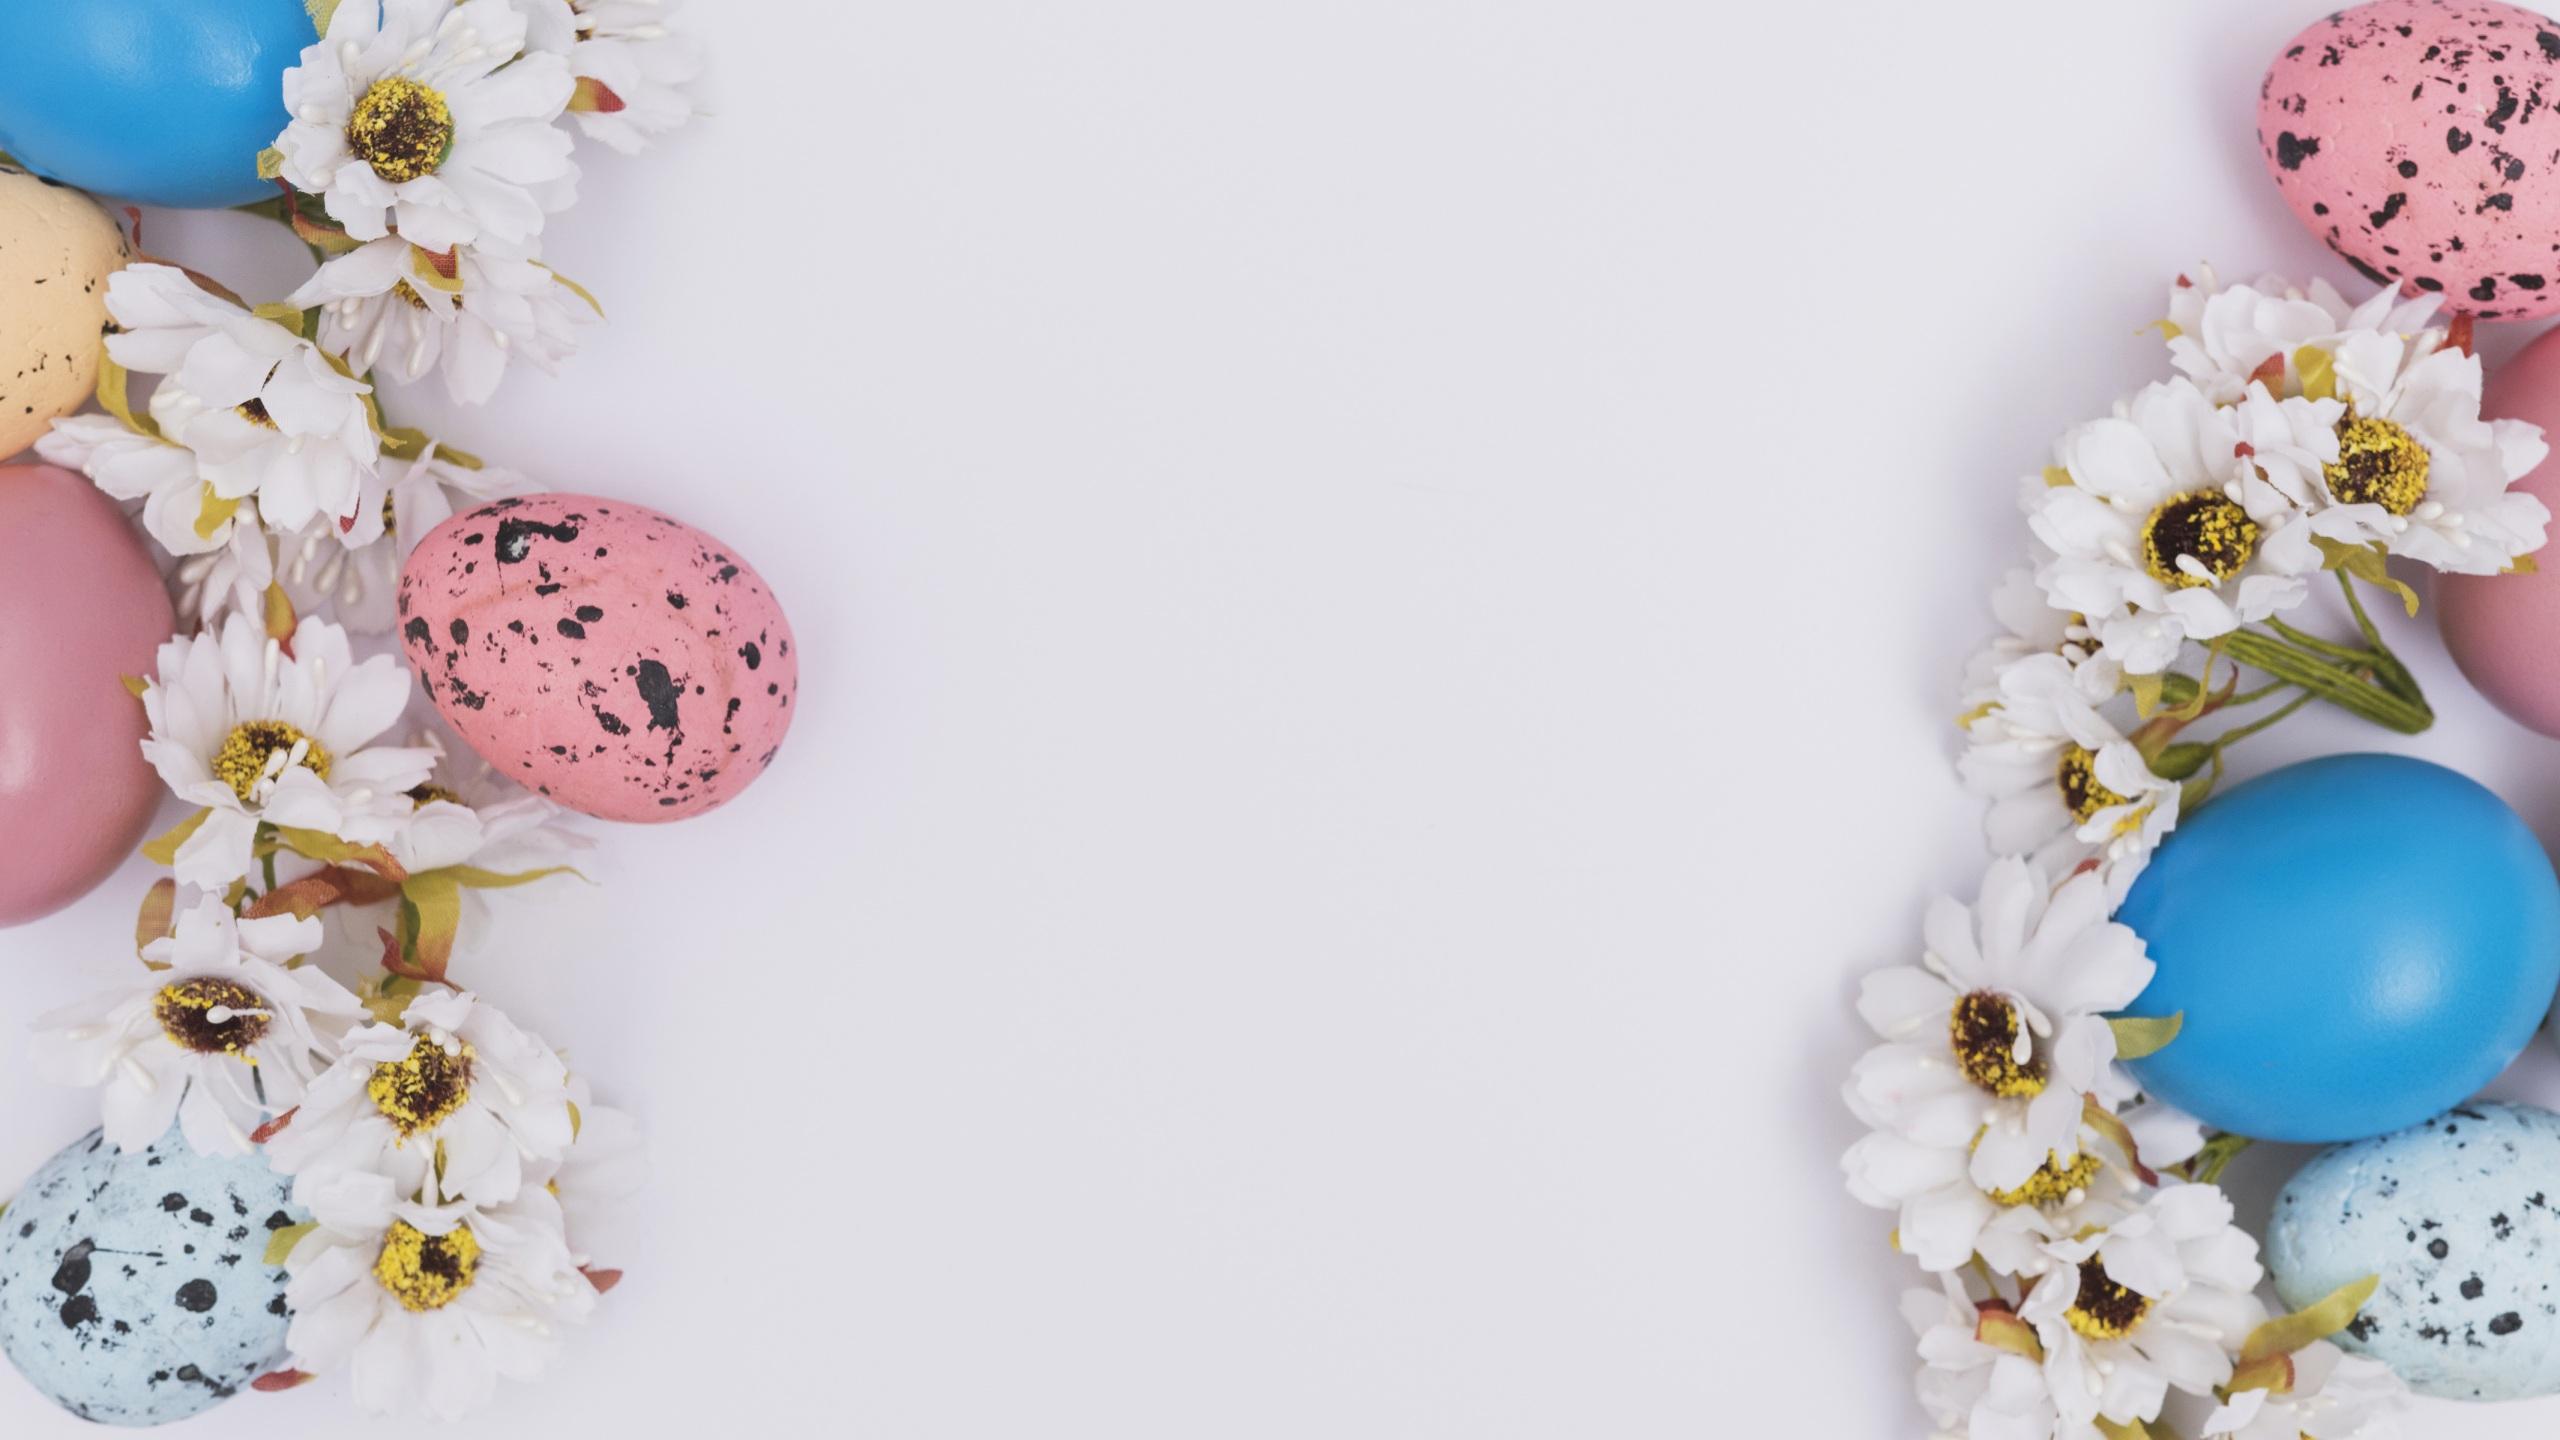 Image Easter Egg Chrysanths White Background 2560x1440